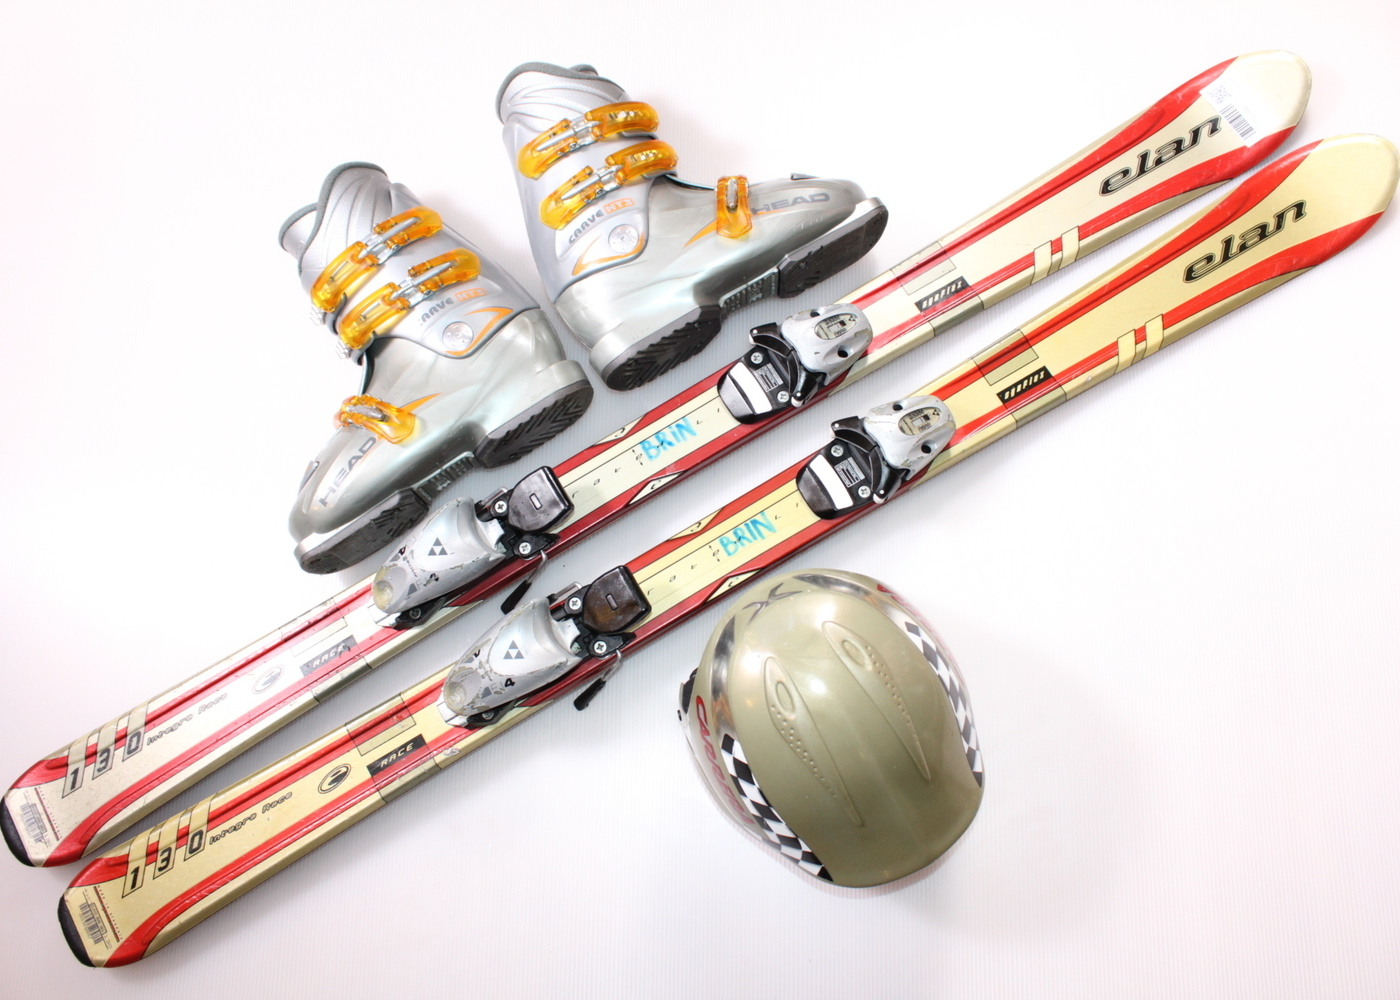 Dětské lyže ELAN SYNFLEX 130 cm + lyžáky  38EU + helma